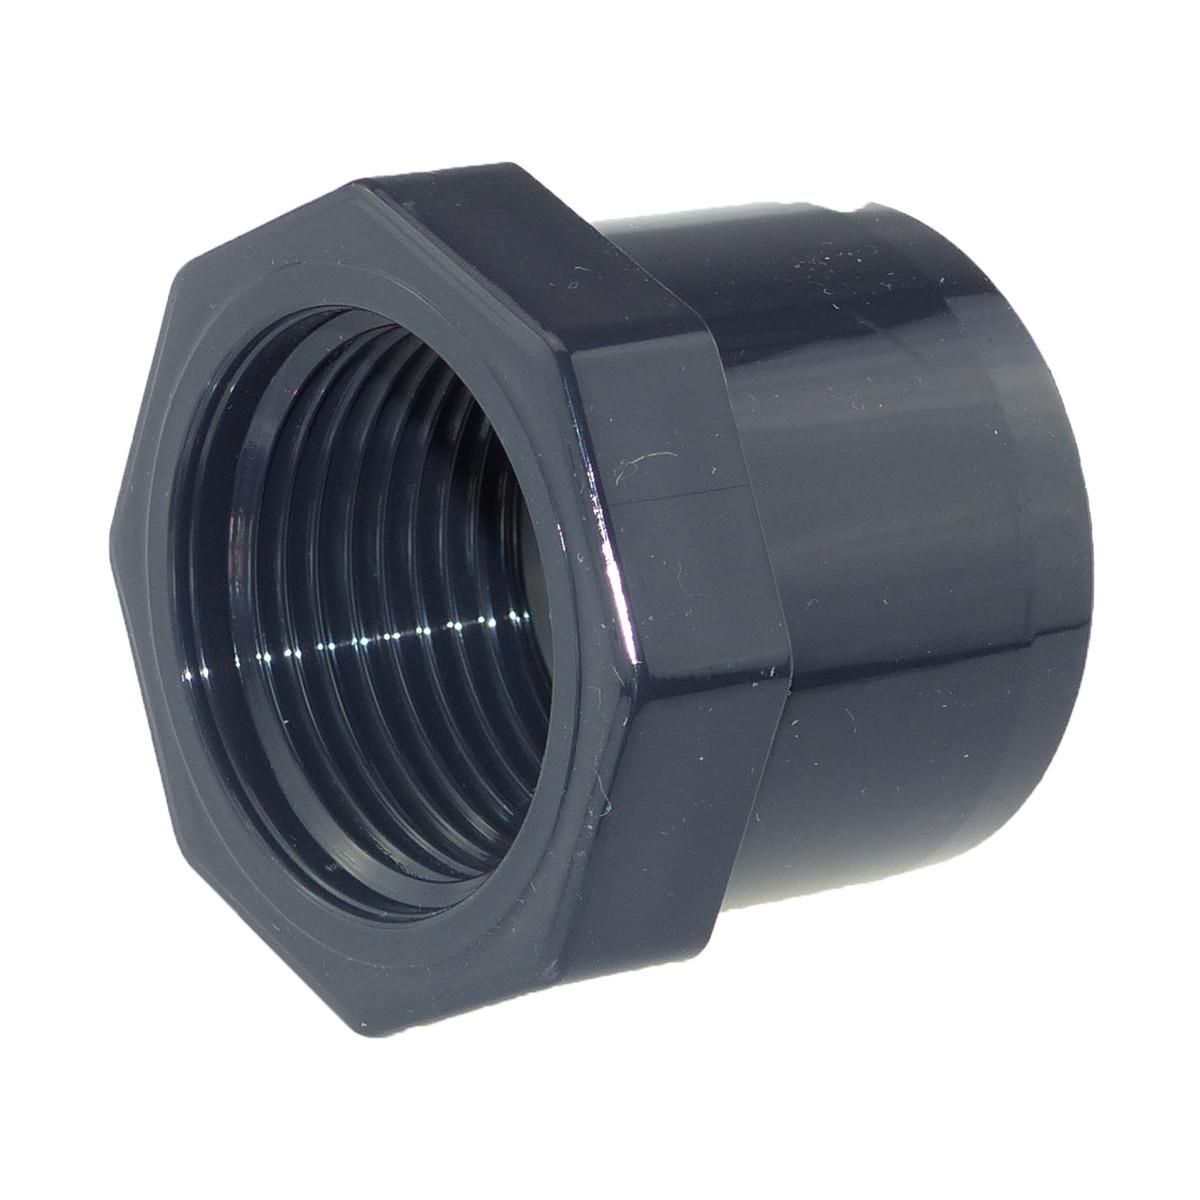 Cepex/Plimat/CH PVC Reduzierstutzen 25 mm x 3/8 Zoll